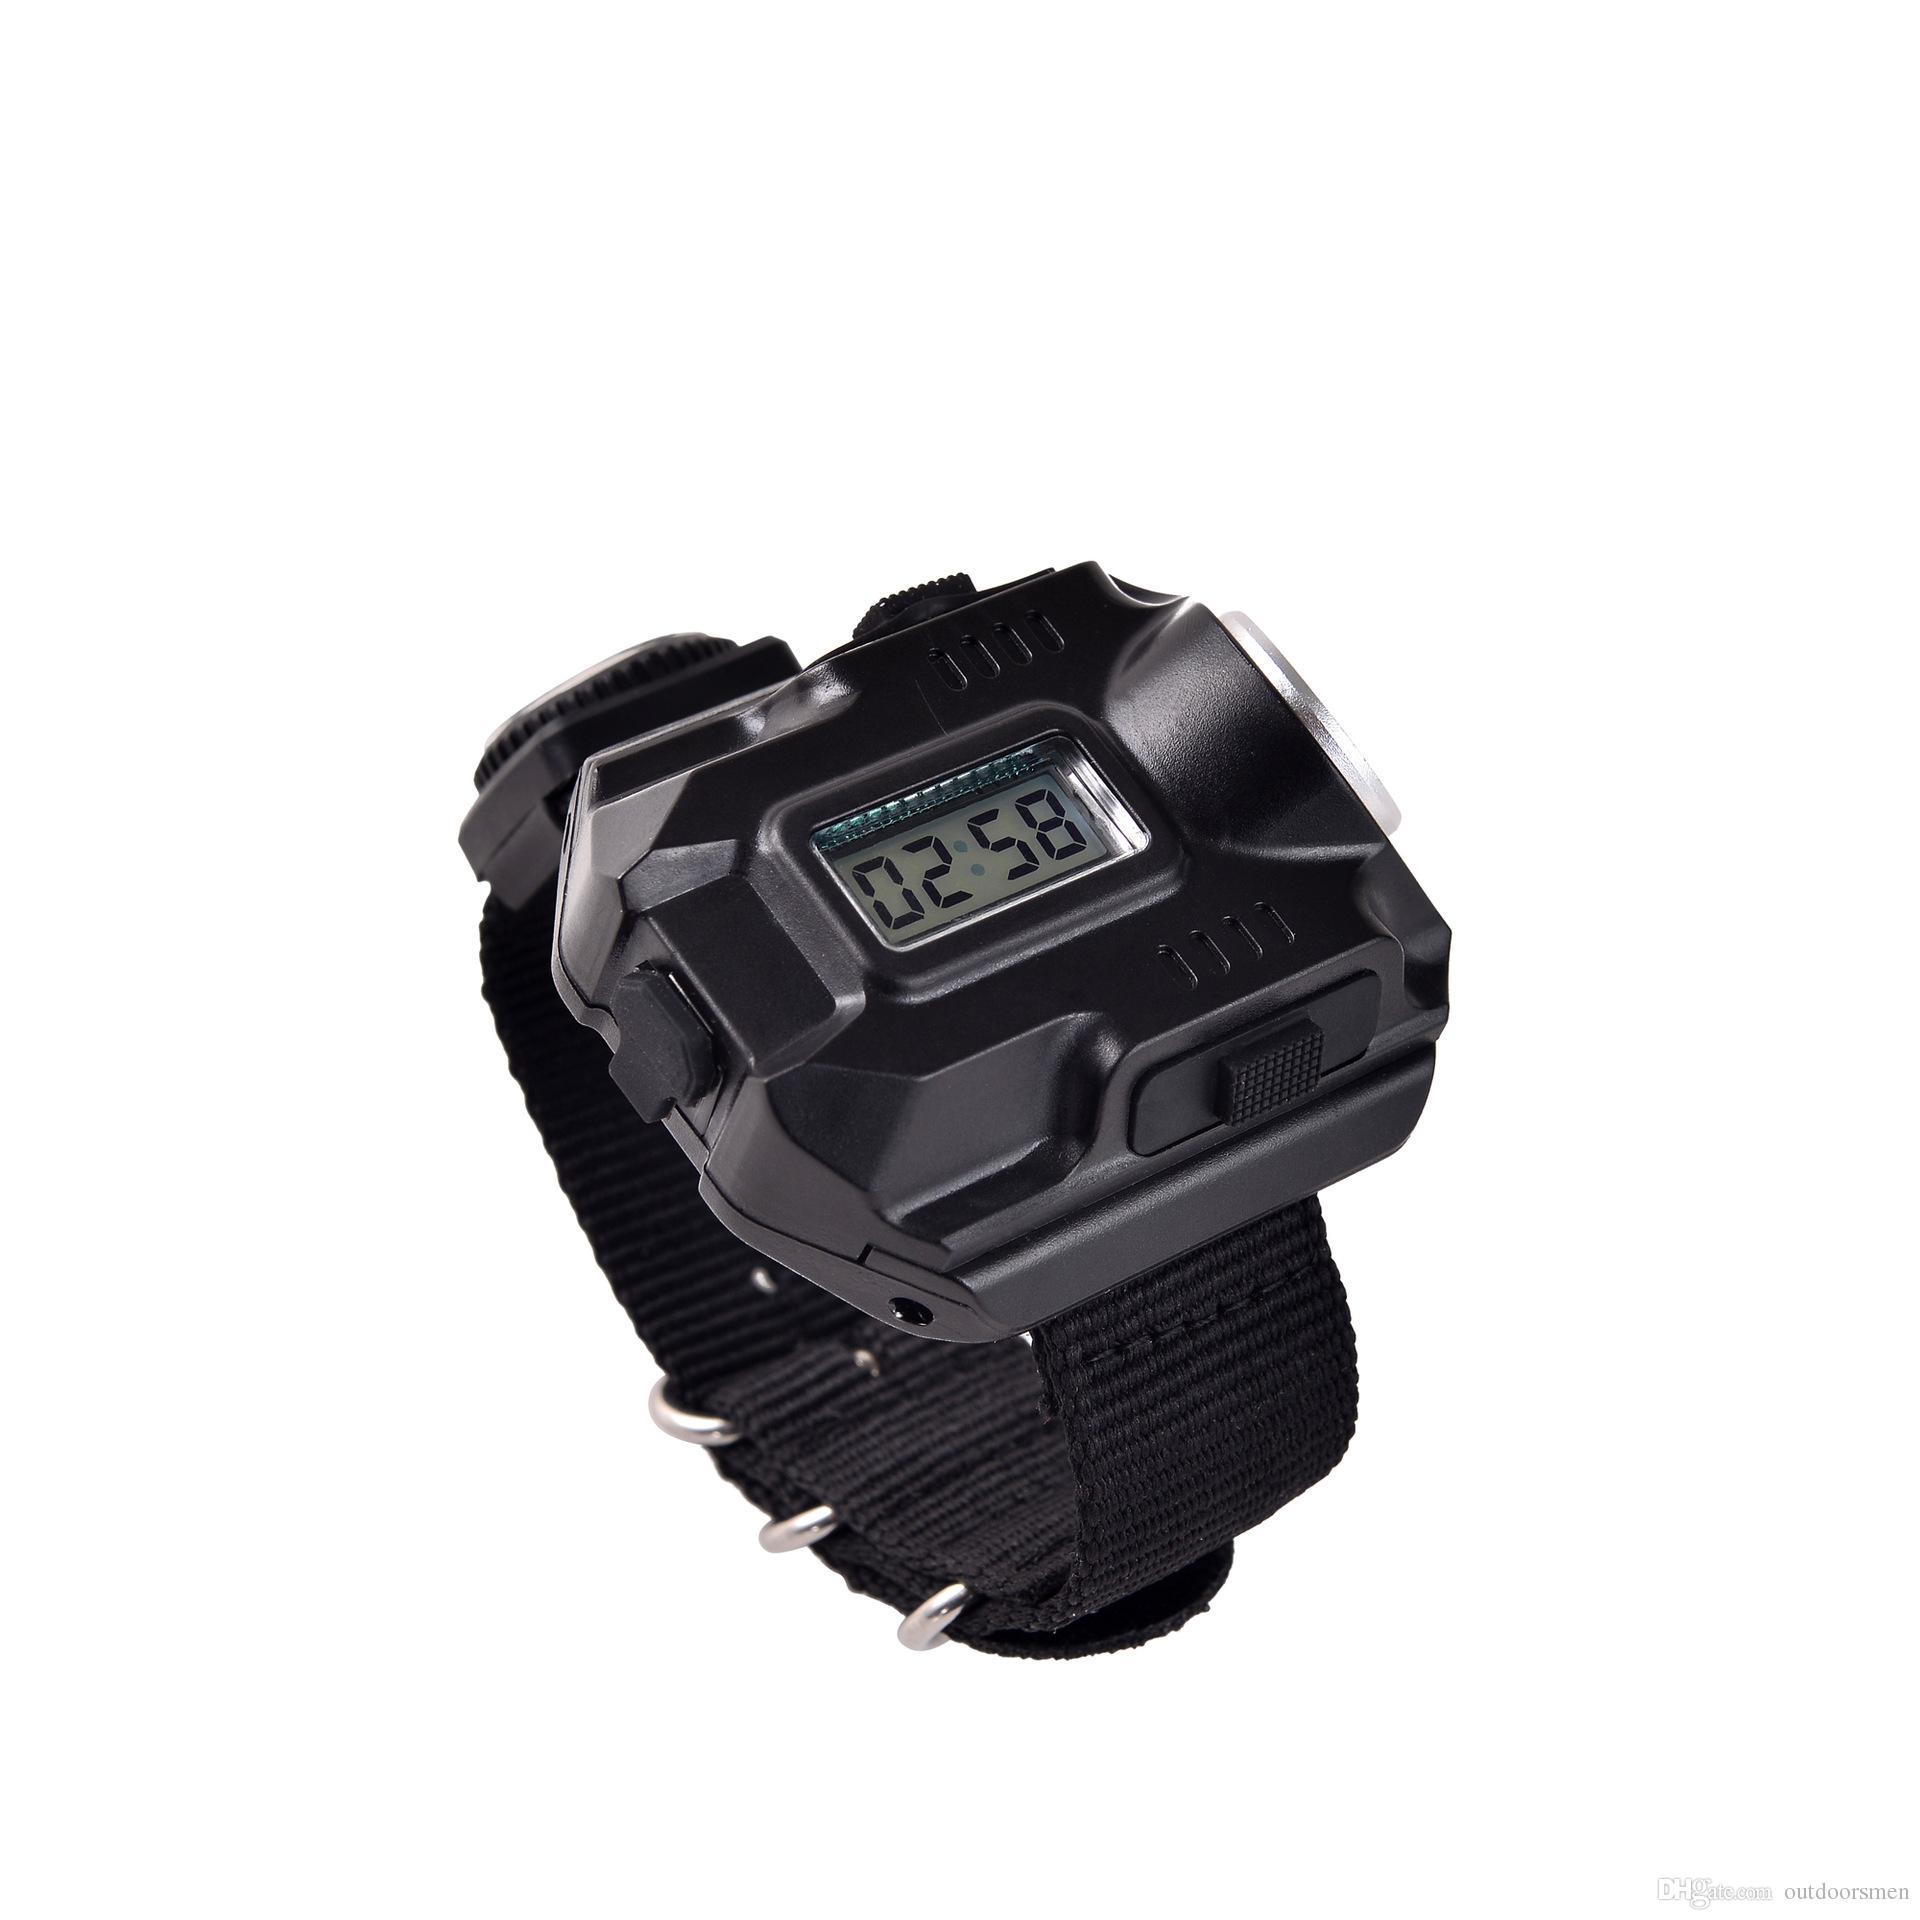 Multifuncional impermeable reloj deportivo linterna LED antorcha lámpara luz láser reloj de pulsera altura media flash bajo sos